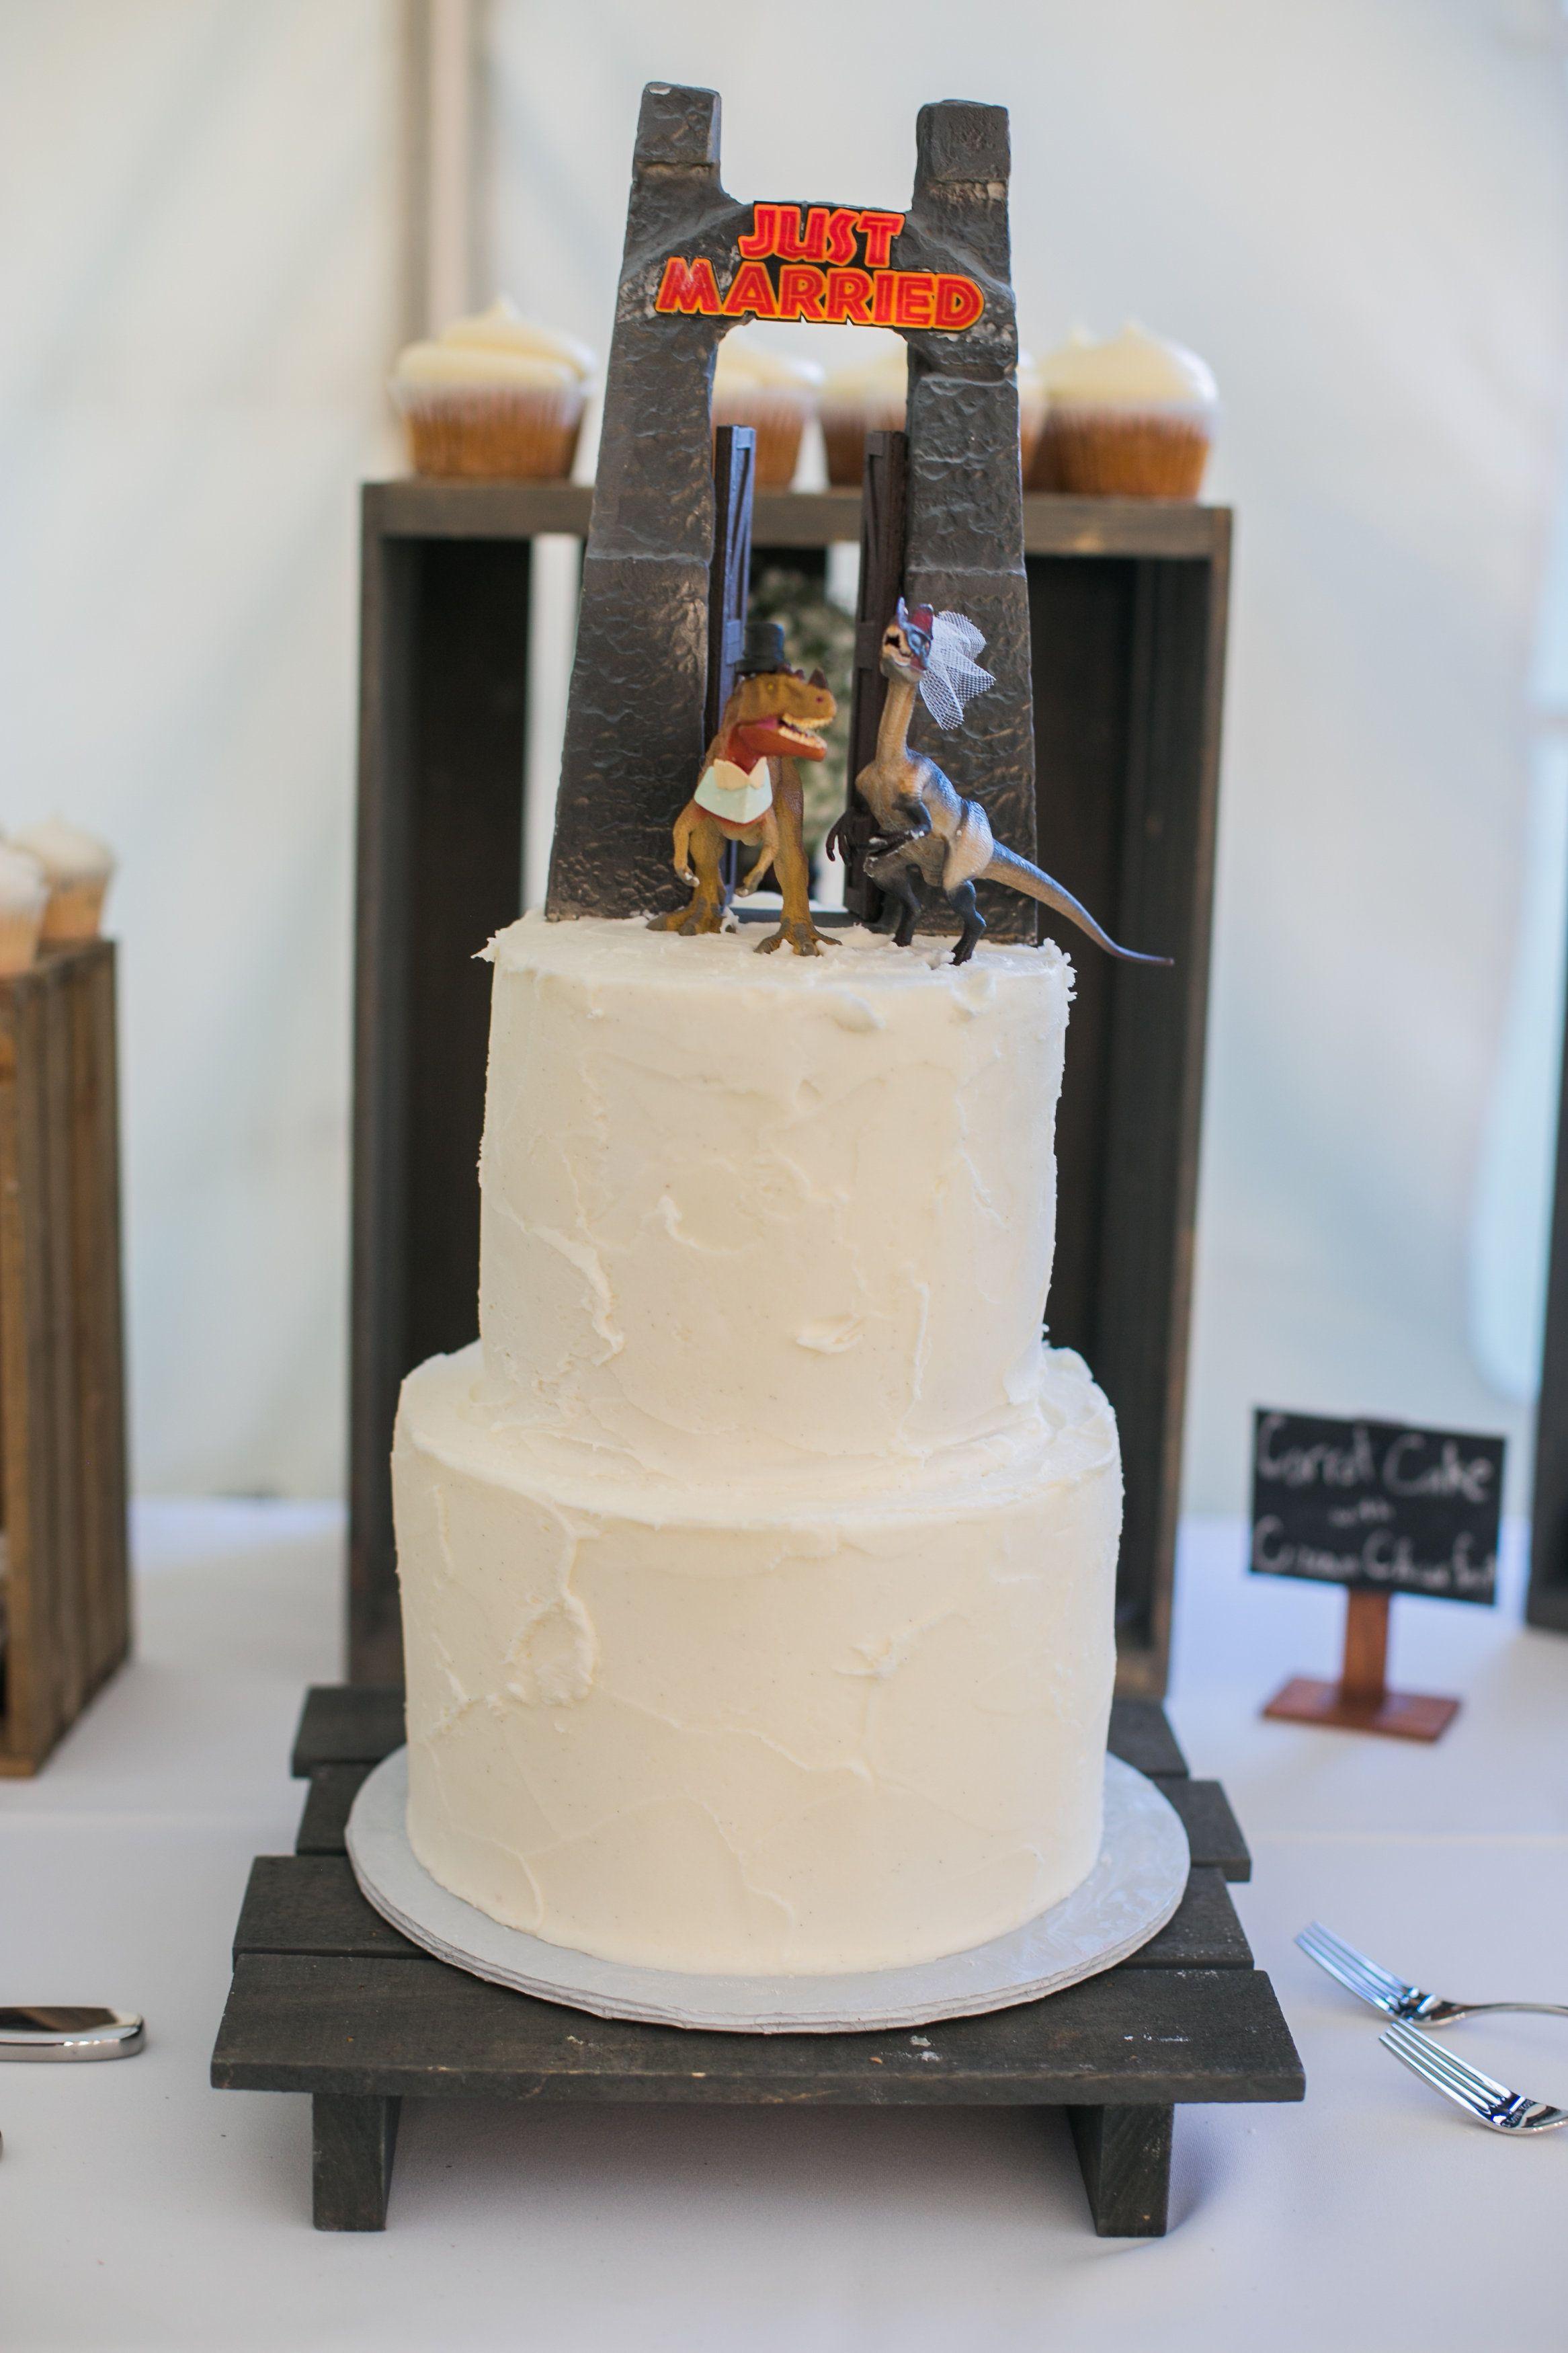 Juric Park Themed Wedding Cake